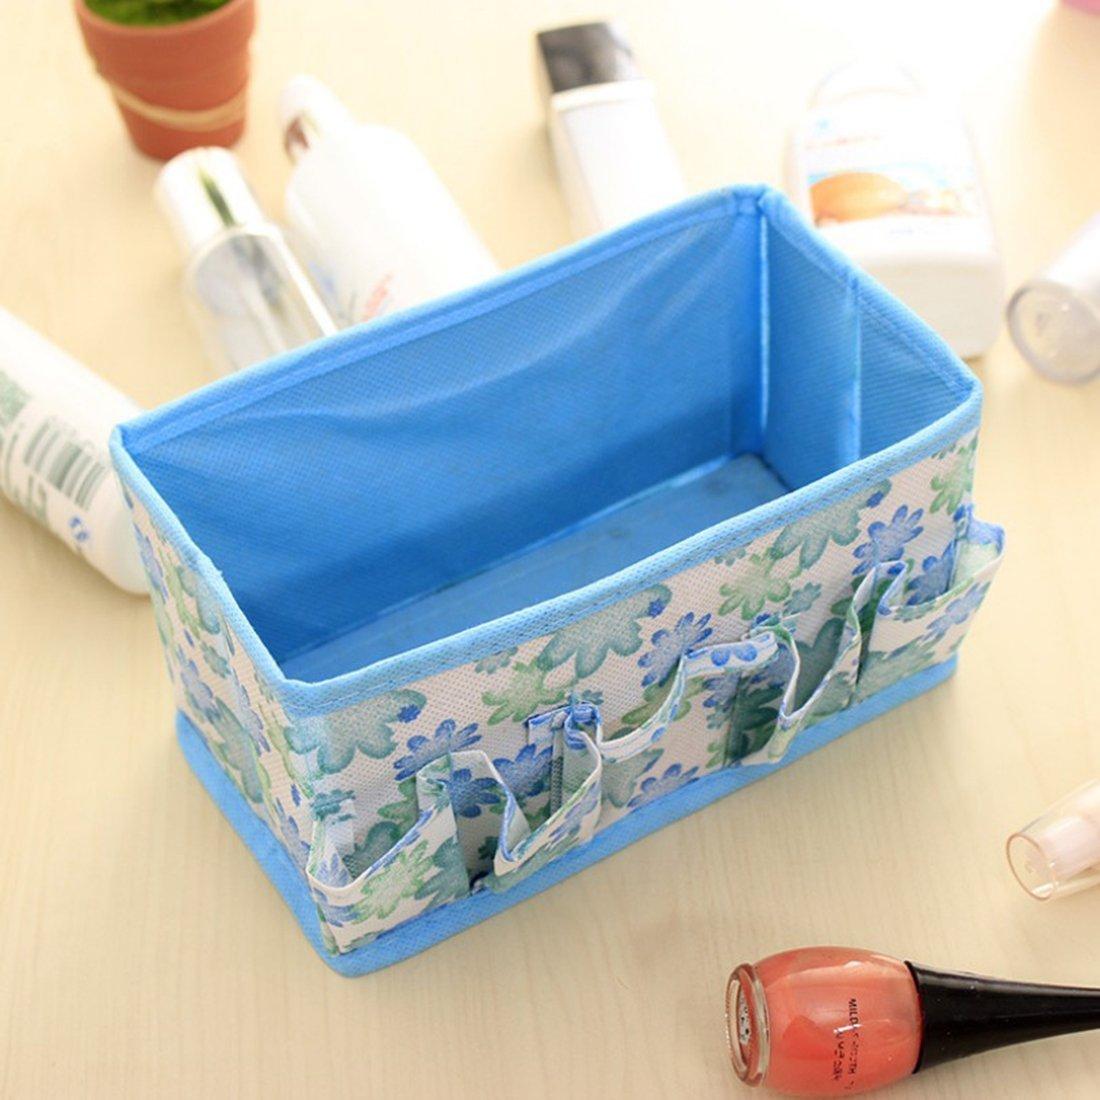 Amazon.com: eDealMax Blanco Azul del Modelo de Flores ropa Interior calcetines plegable Caja de almacenamiento Bolsa: Home & Kitchen